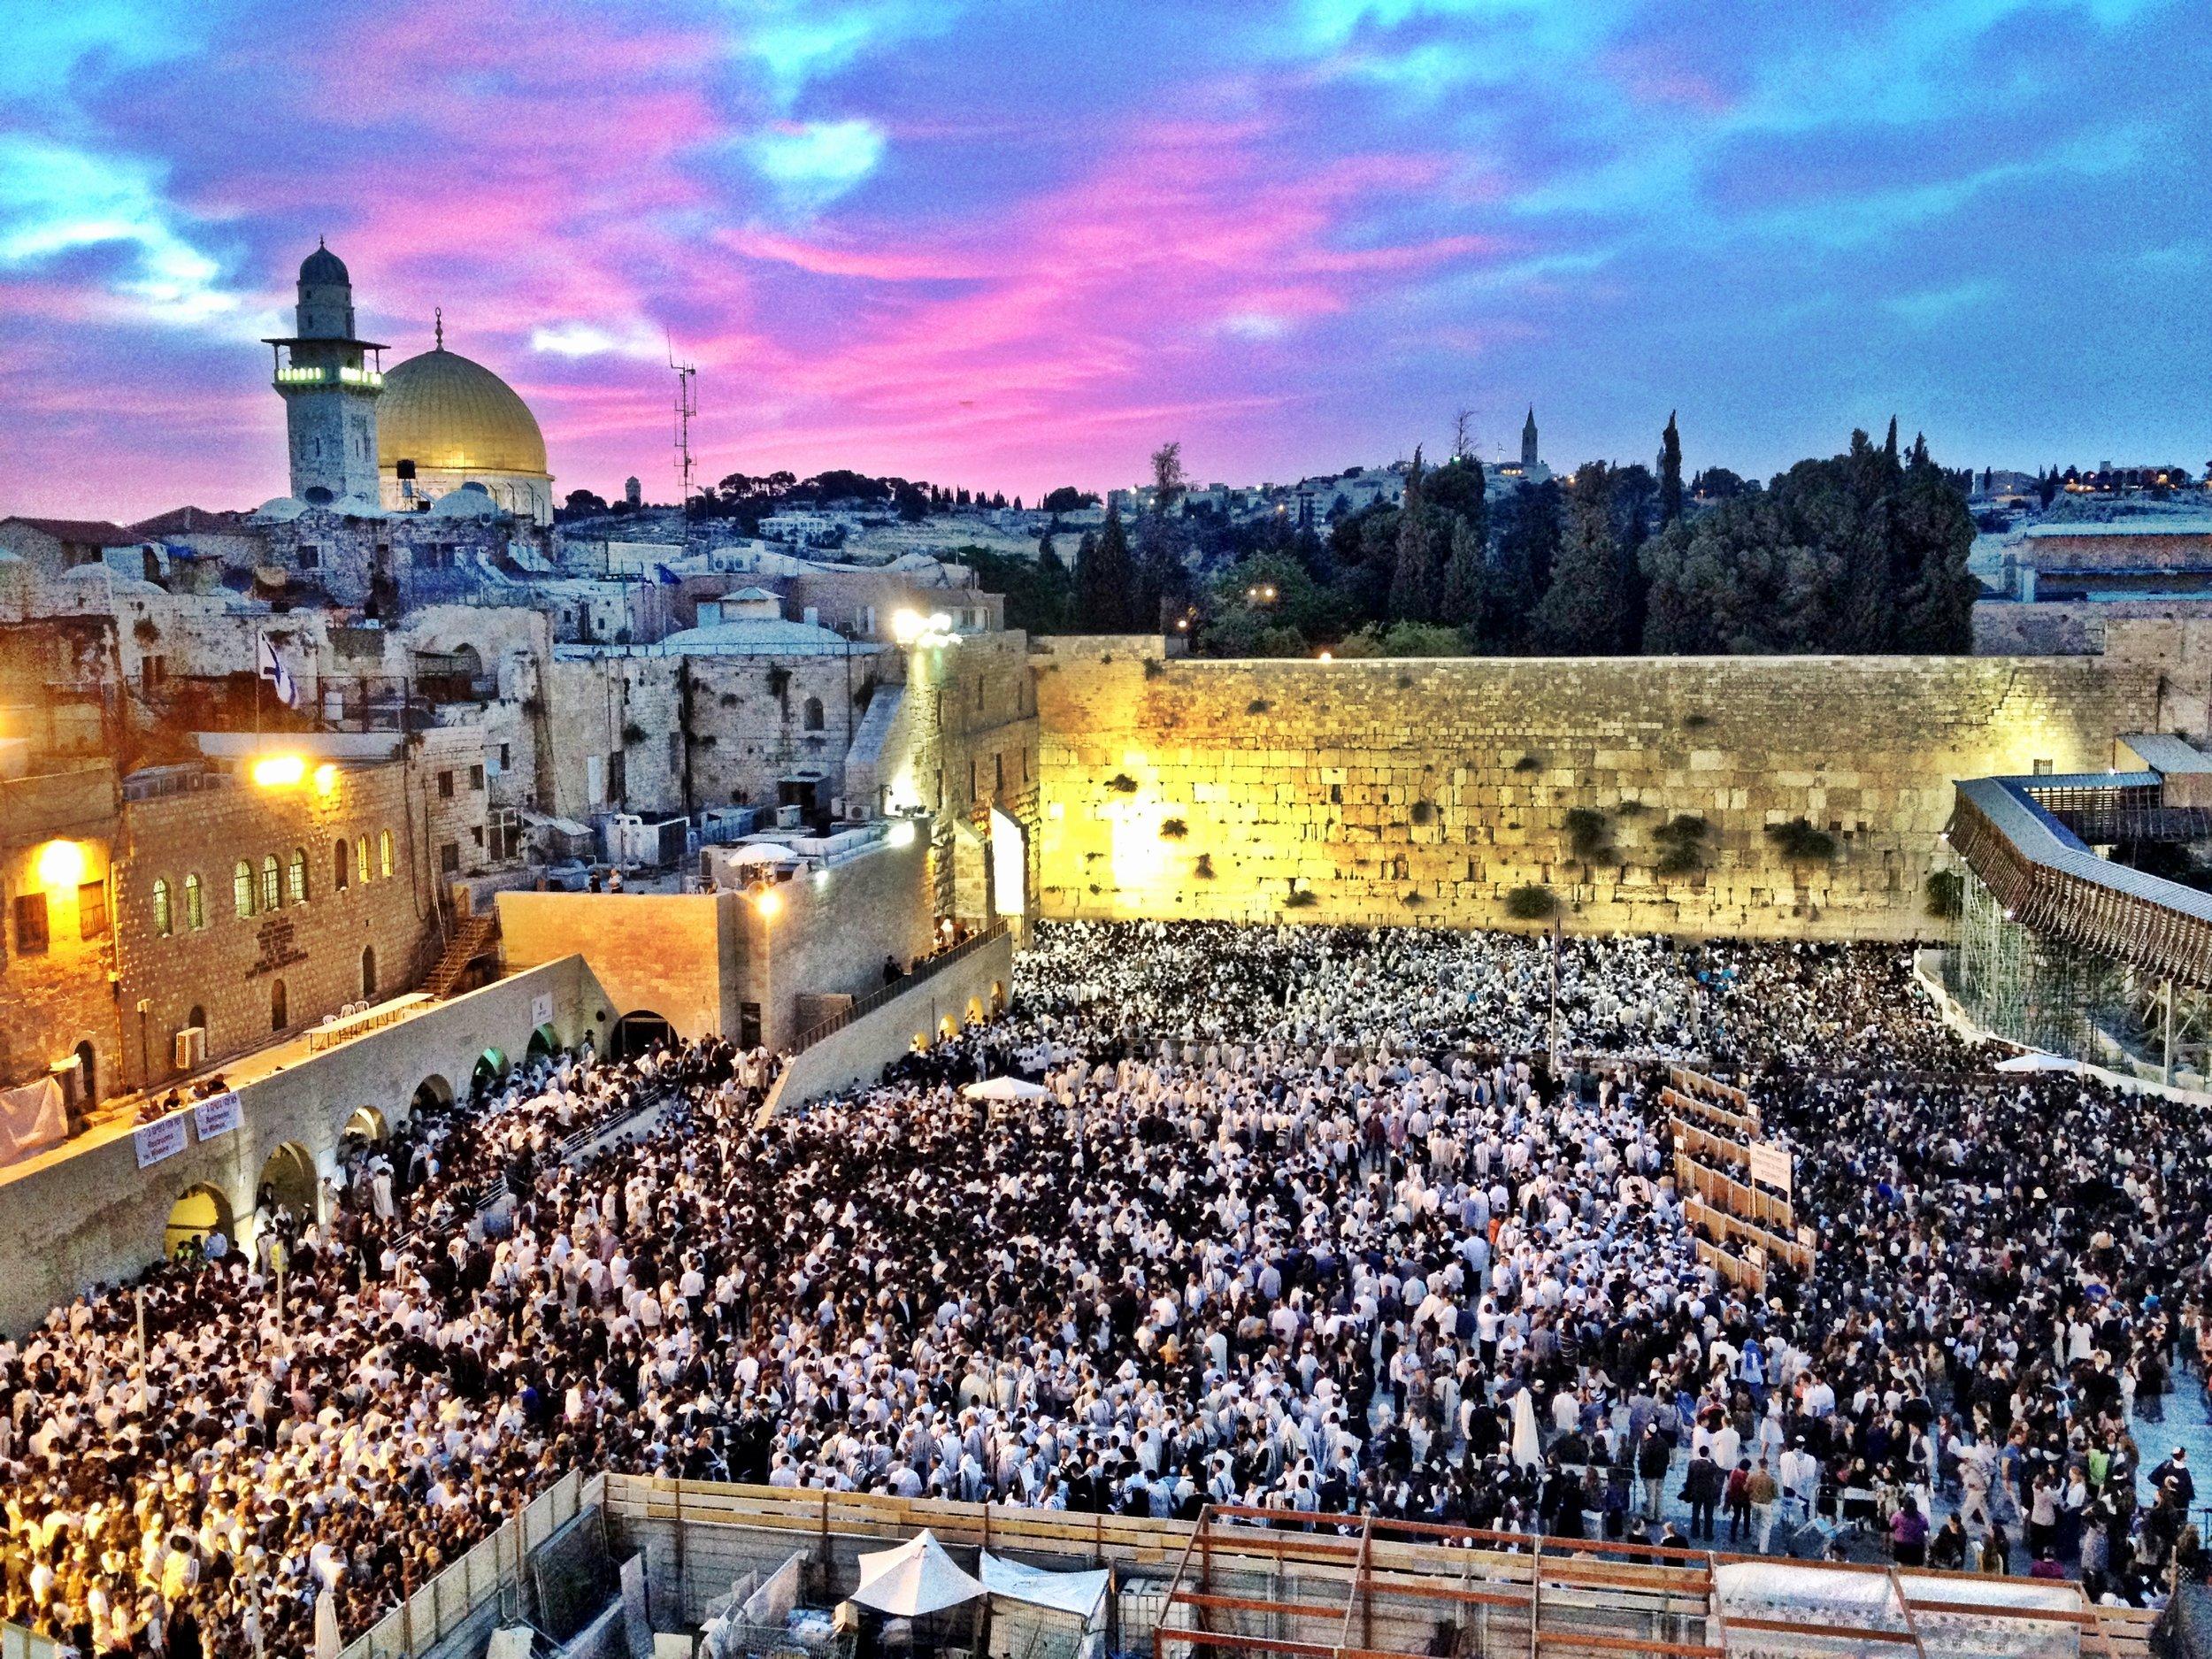 Western_Wall_Jerusalem_Shavuot-wikimedia-commons.jpg